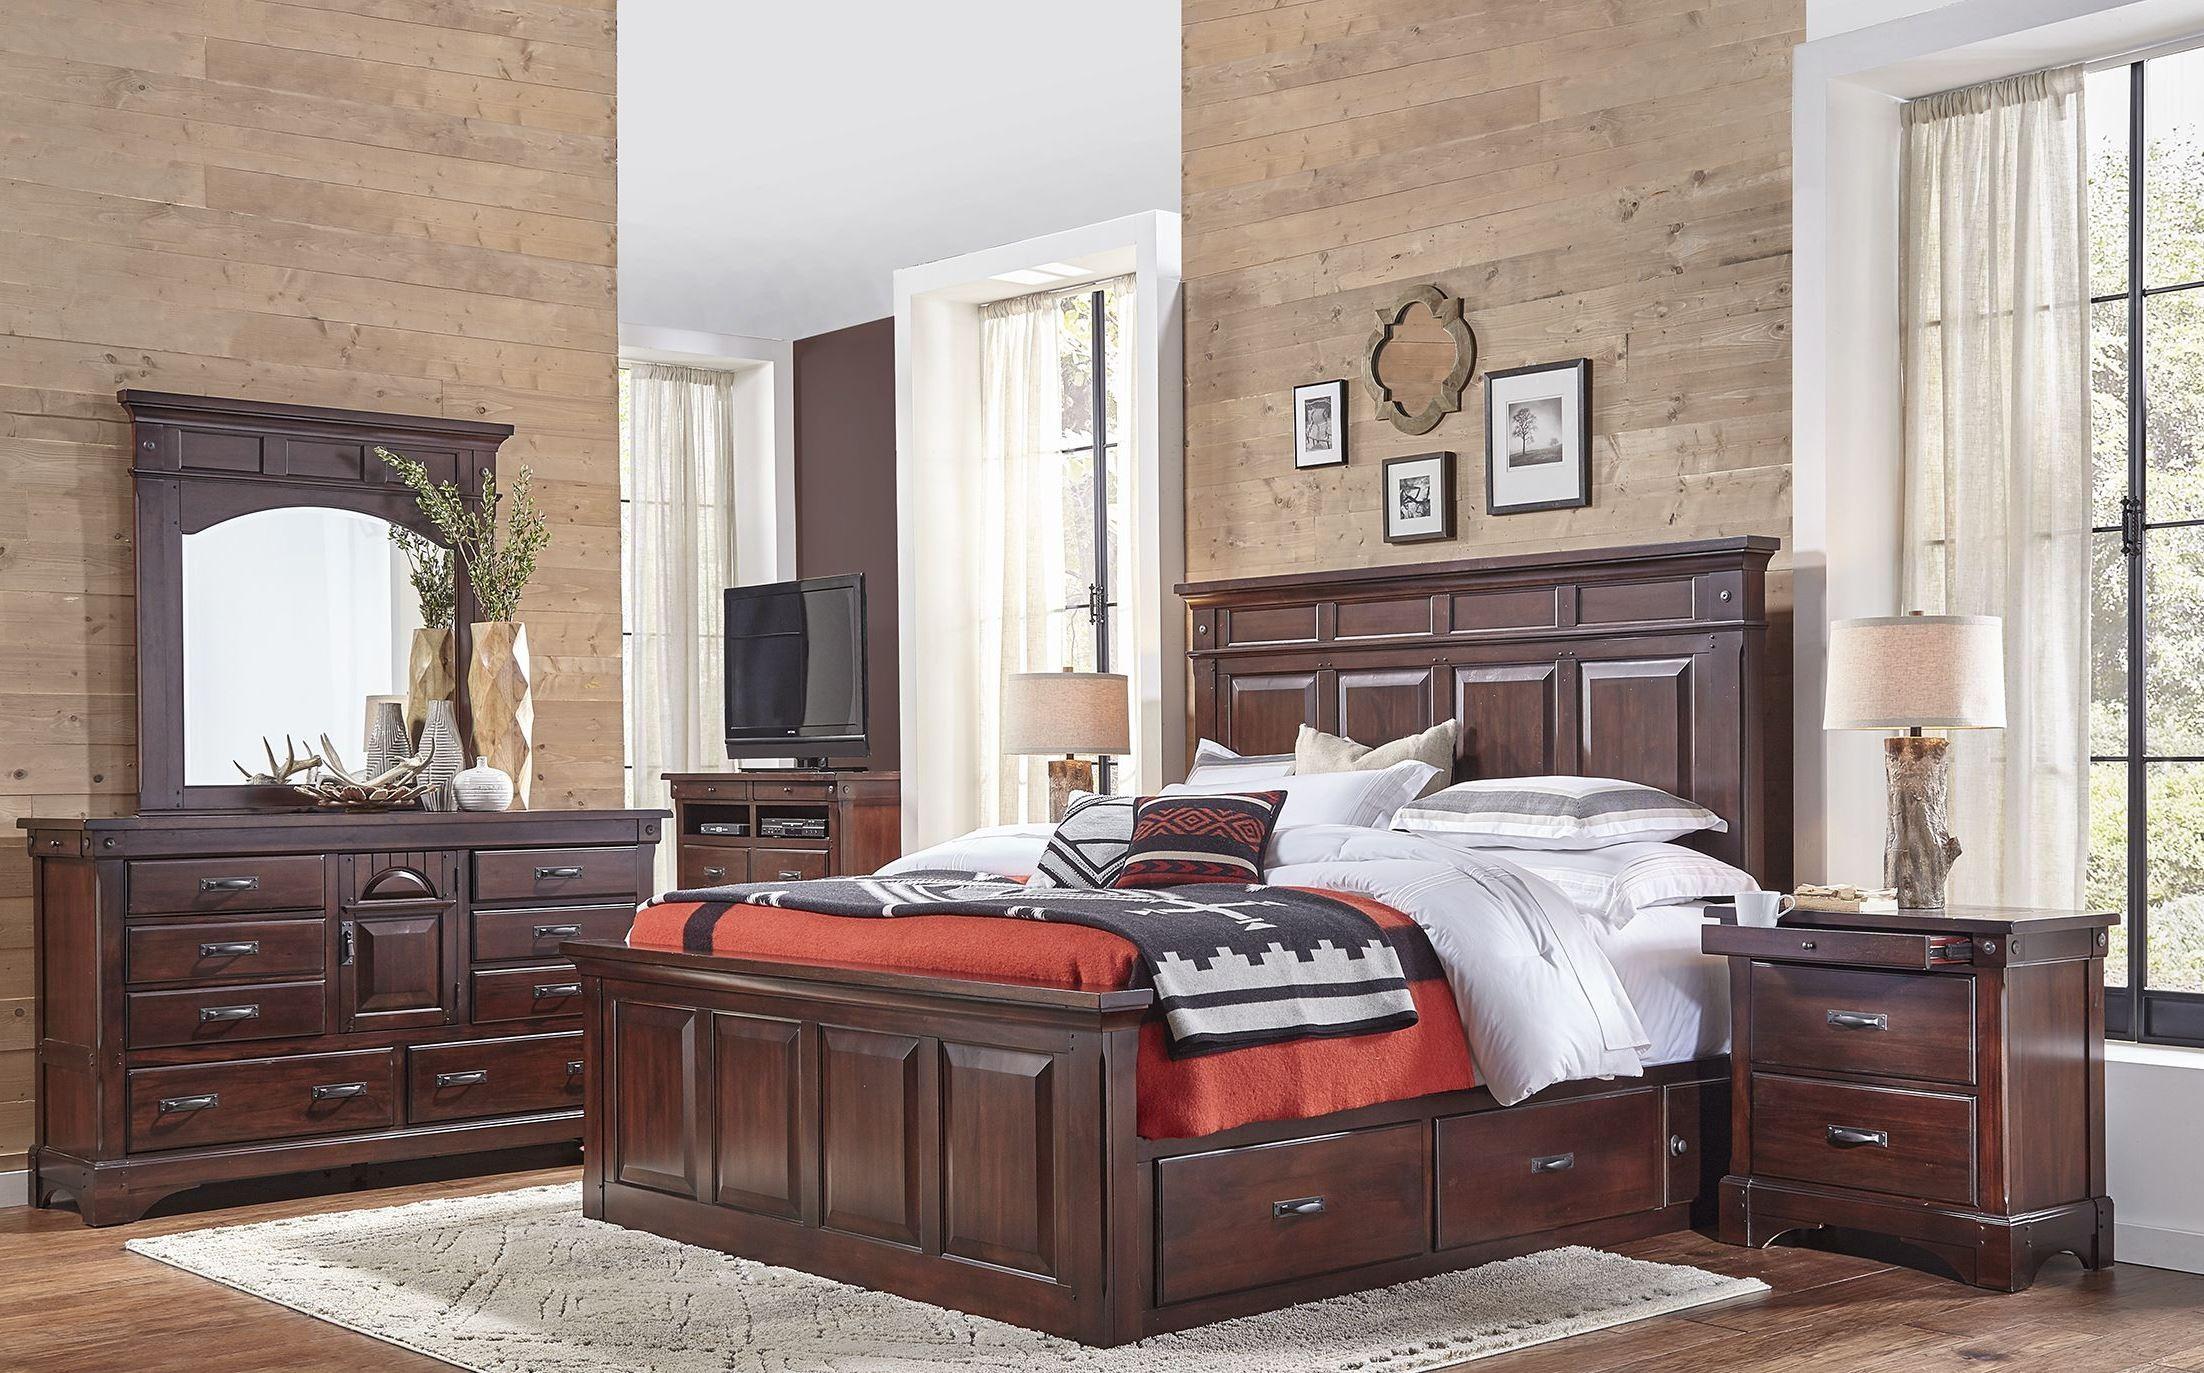 kalispell rustic mahogany storage bedroom set from a